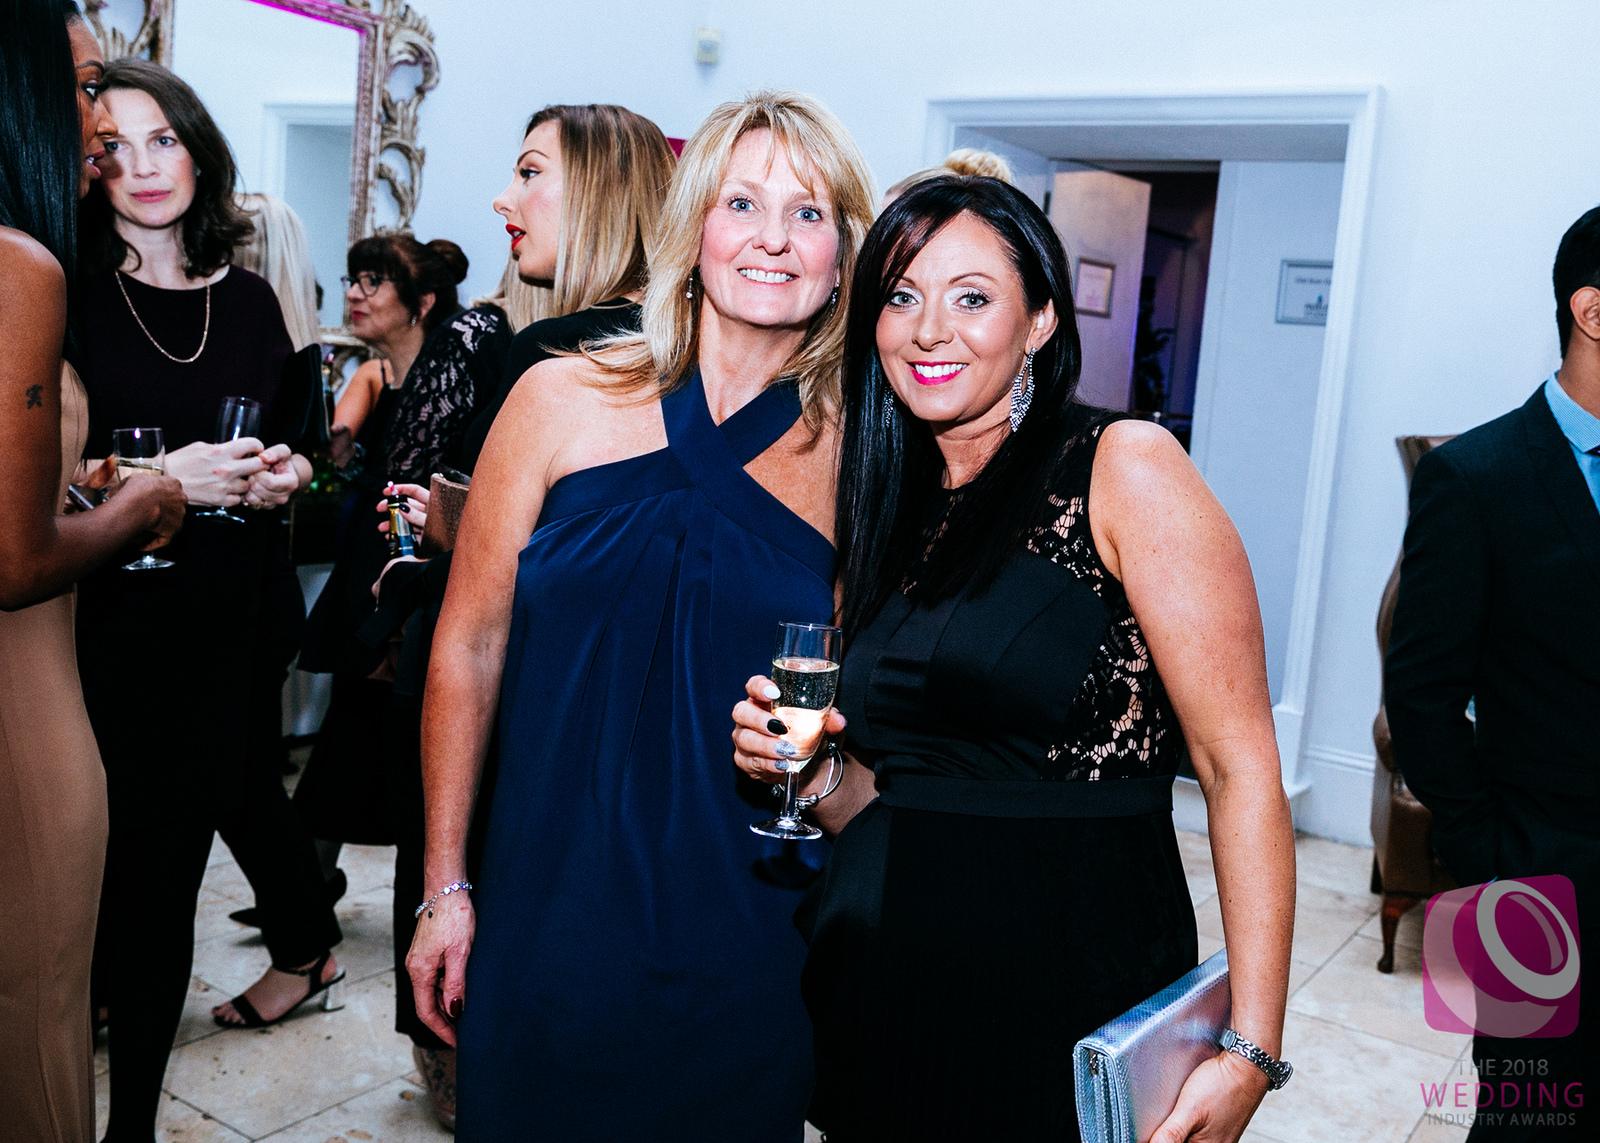 Justine Wykerd Celebrant TWIA18 West Midlands Regional Winner